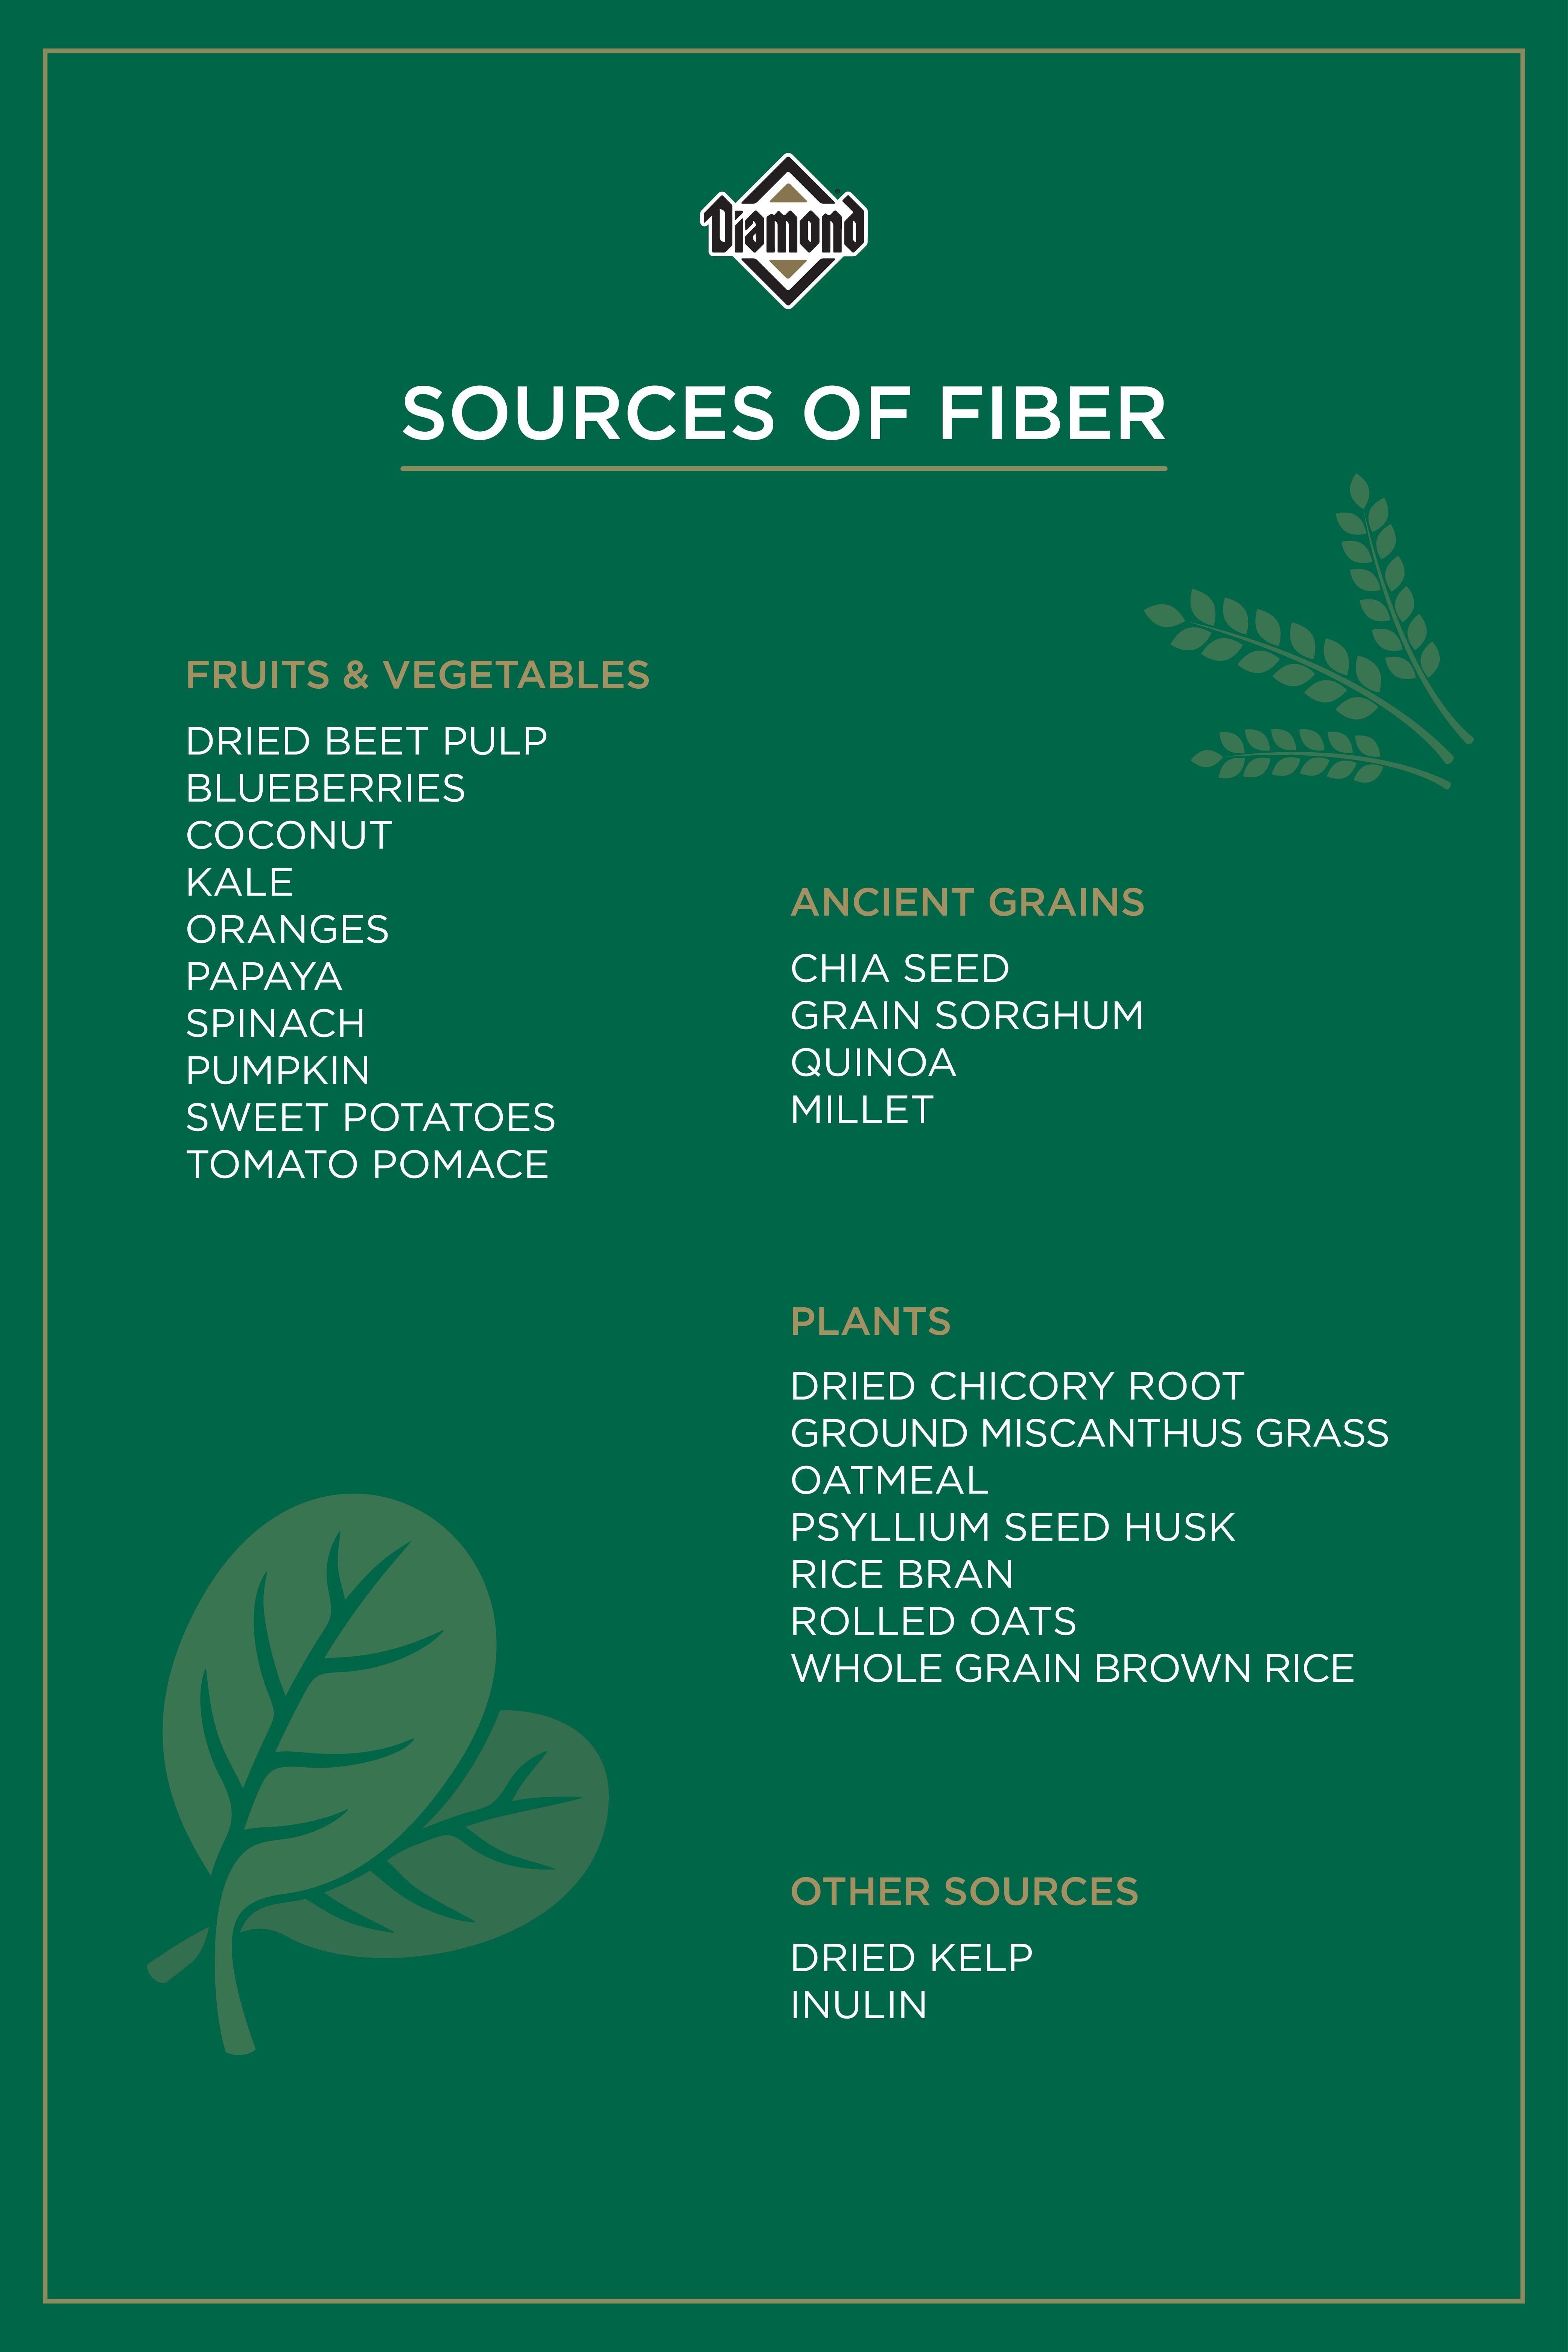 Sources of Fiber Guide   Diamond Pet Foods